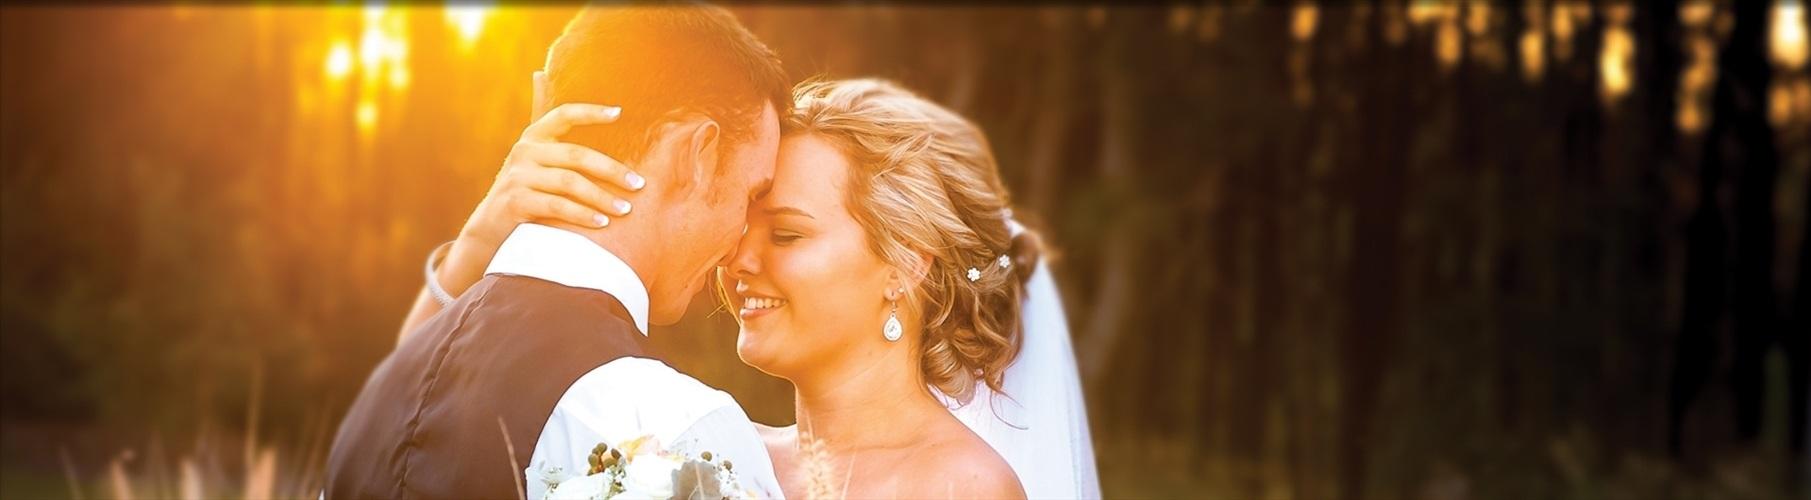 Wedding Venue - Lakelands Golf Club 9 on Veilability